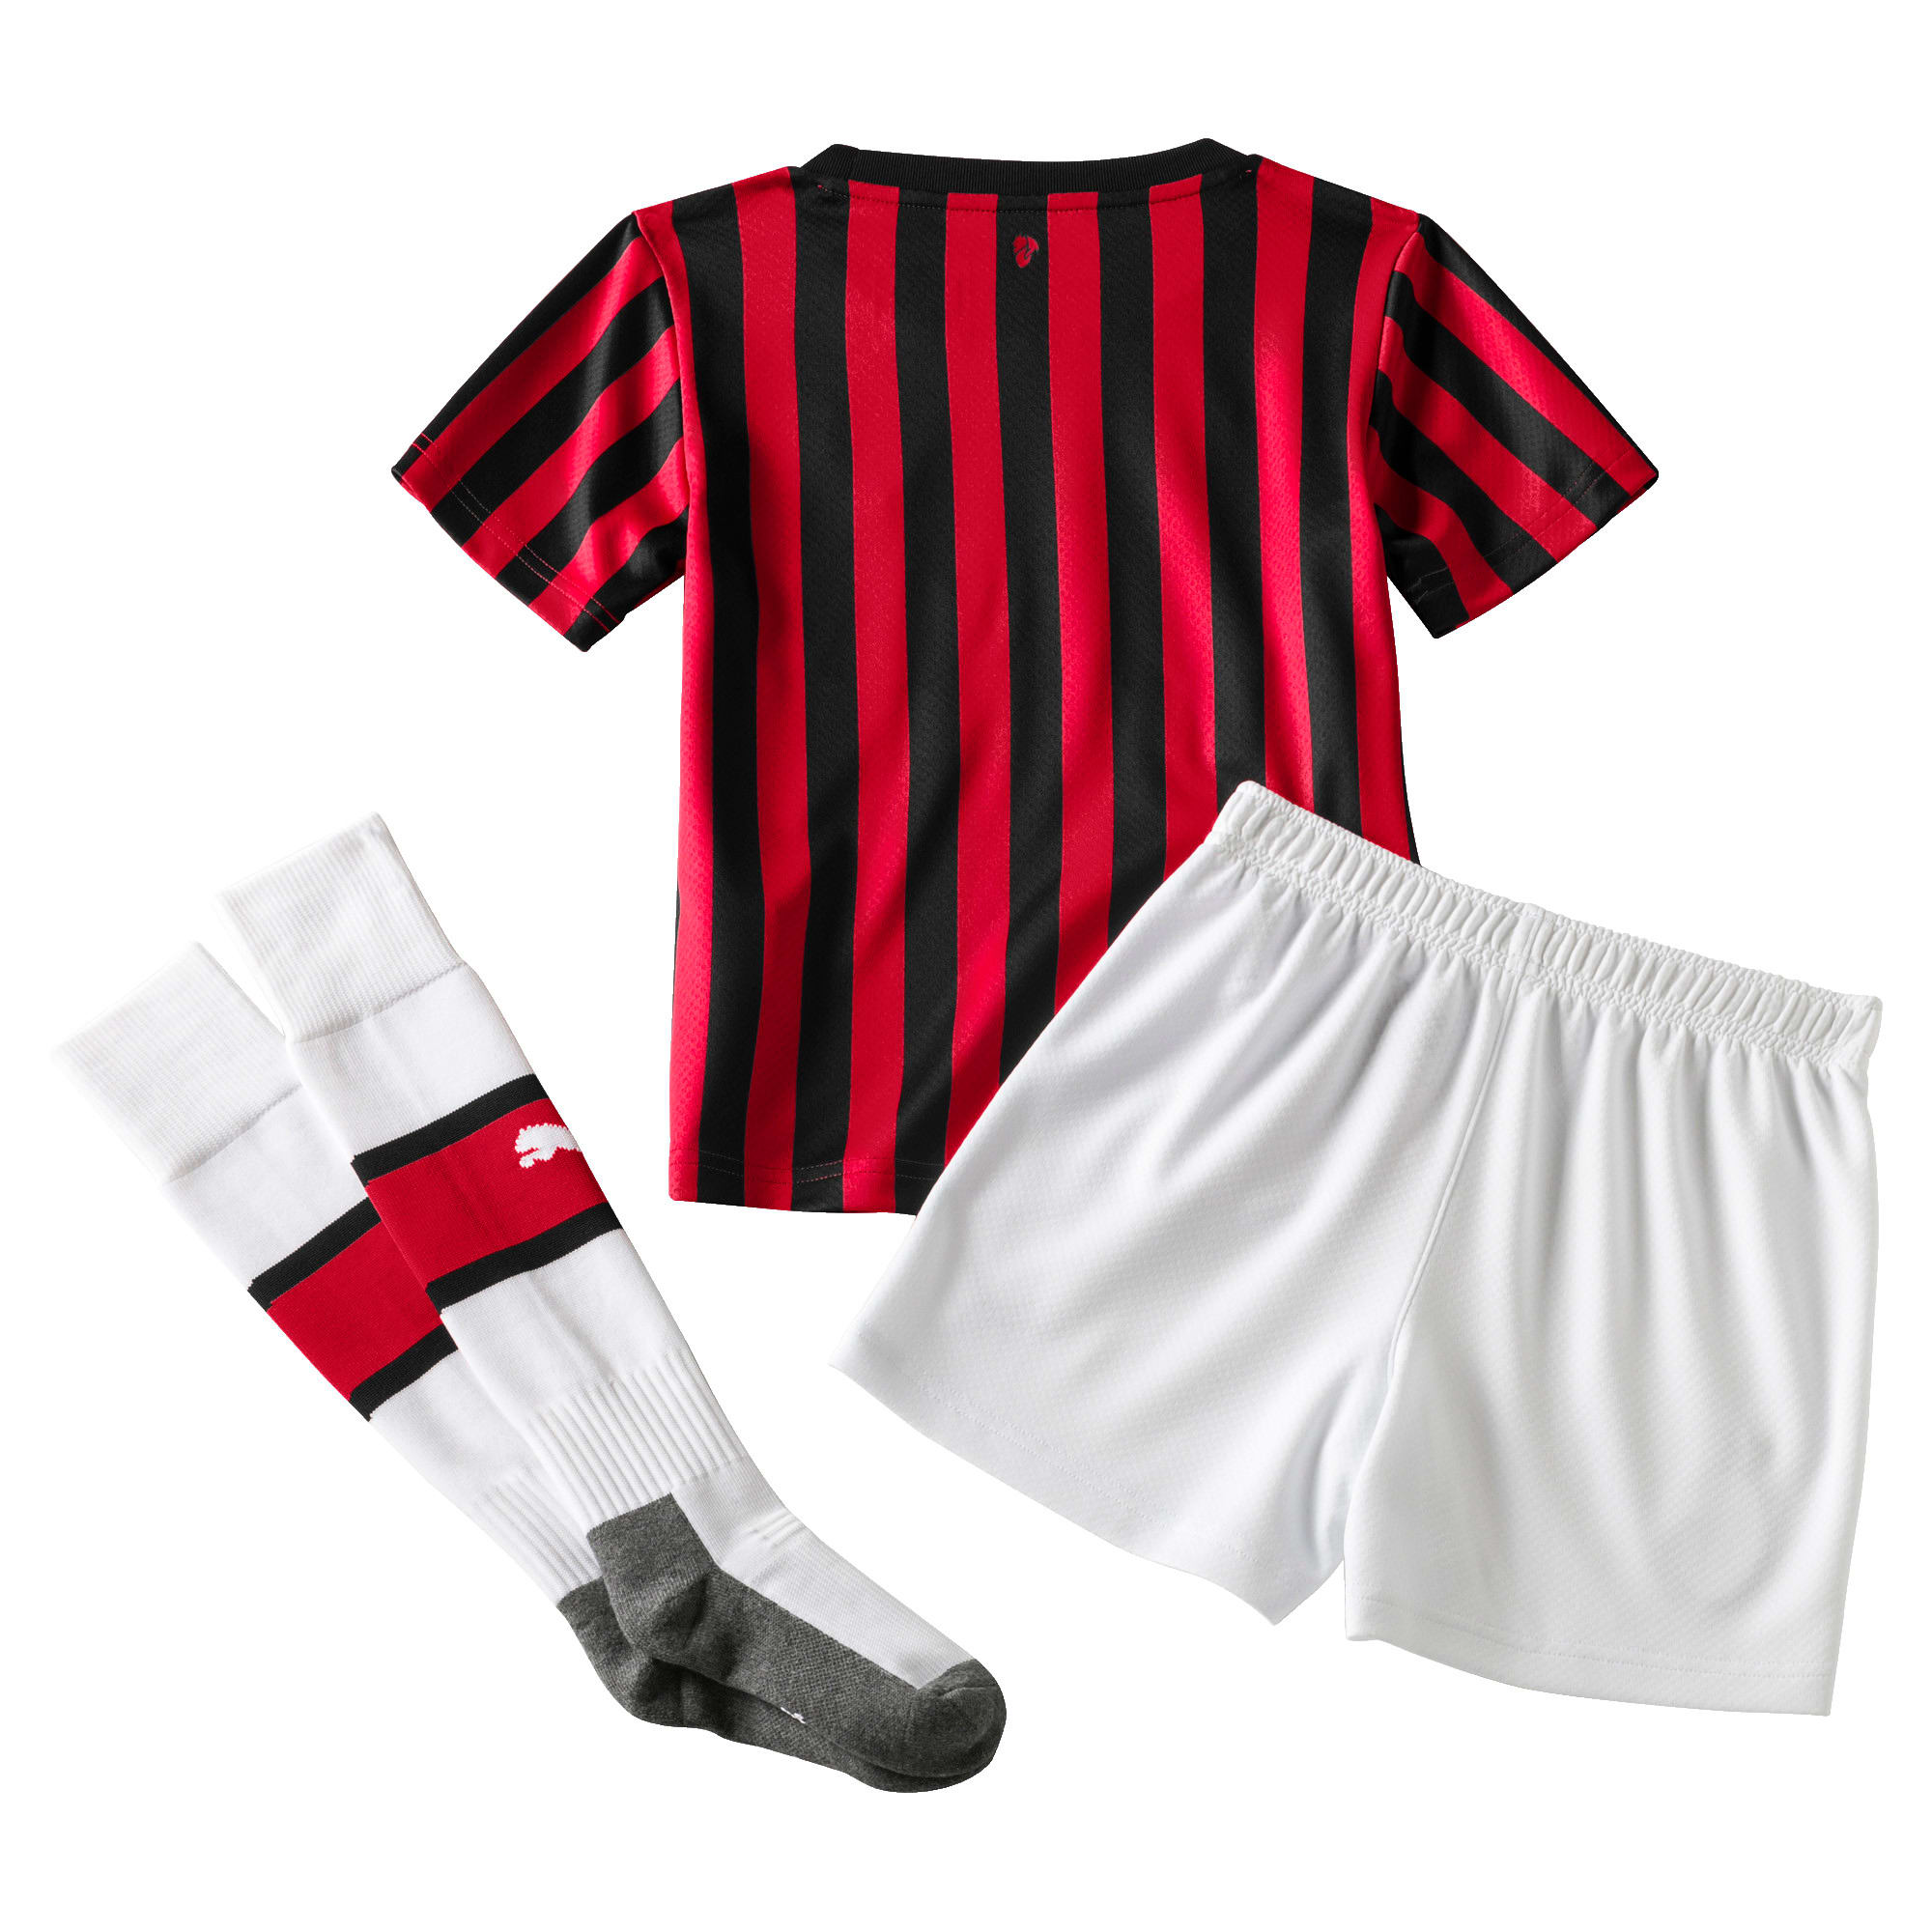 Thumbnail 2 of AC Milan Home Replica Mini Kit, Tango Red -Puma Black, medium